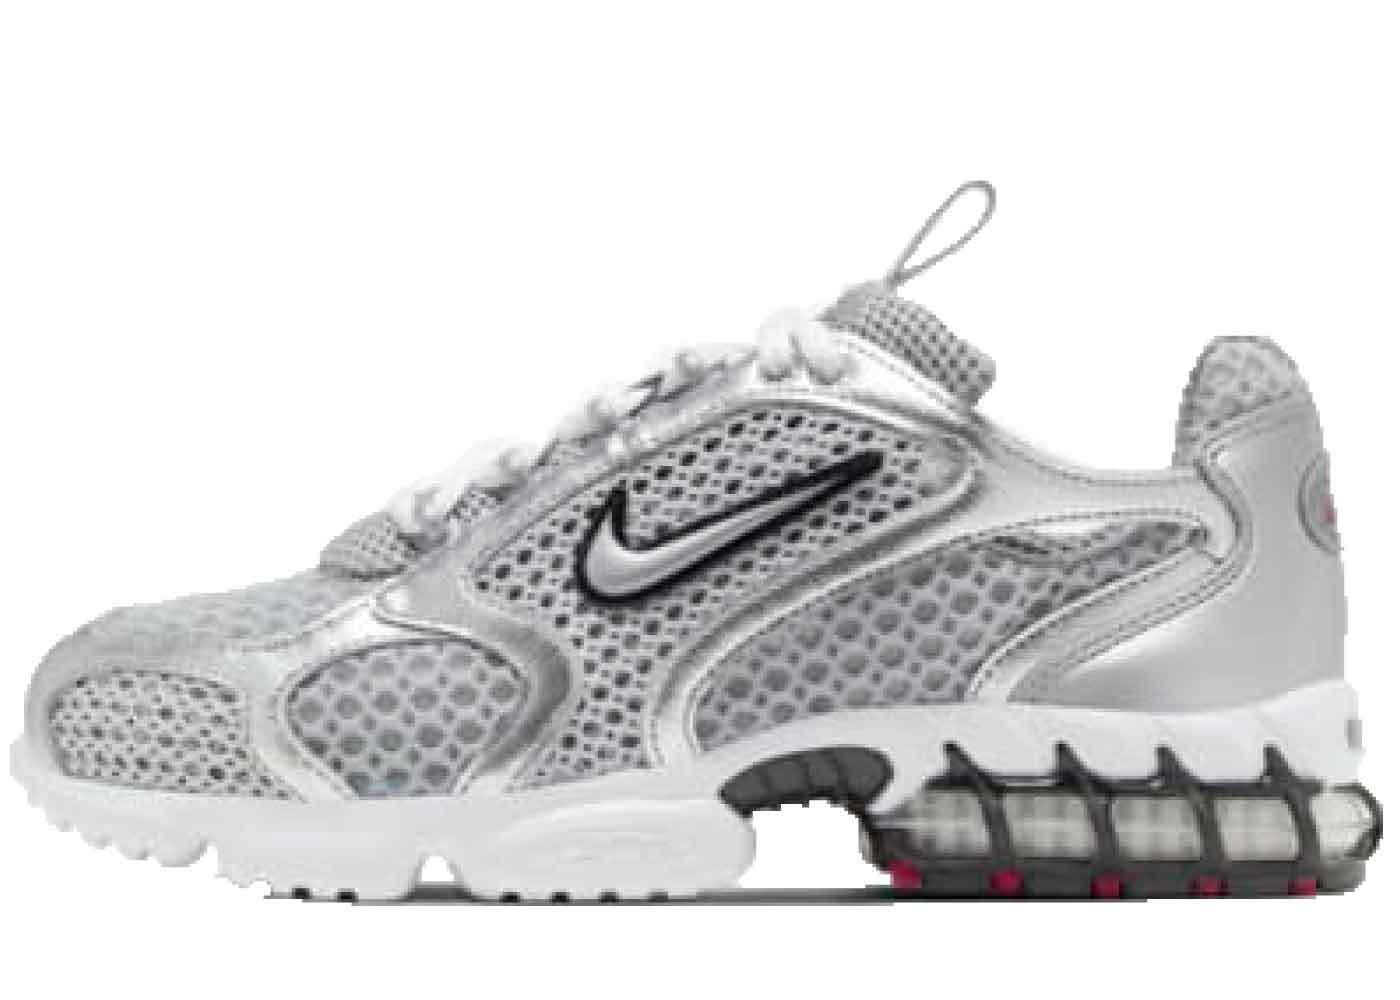 Nike Air Zoom Spiridon Cage 2 Metallic Silver Womensの写真